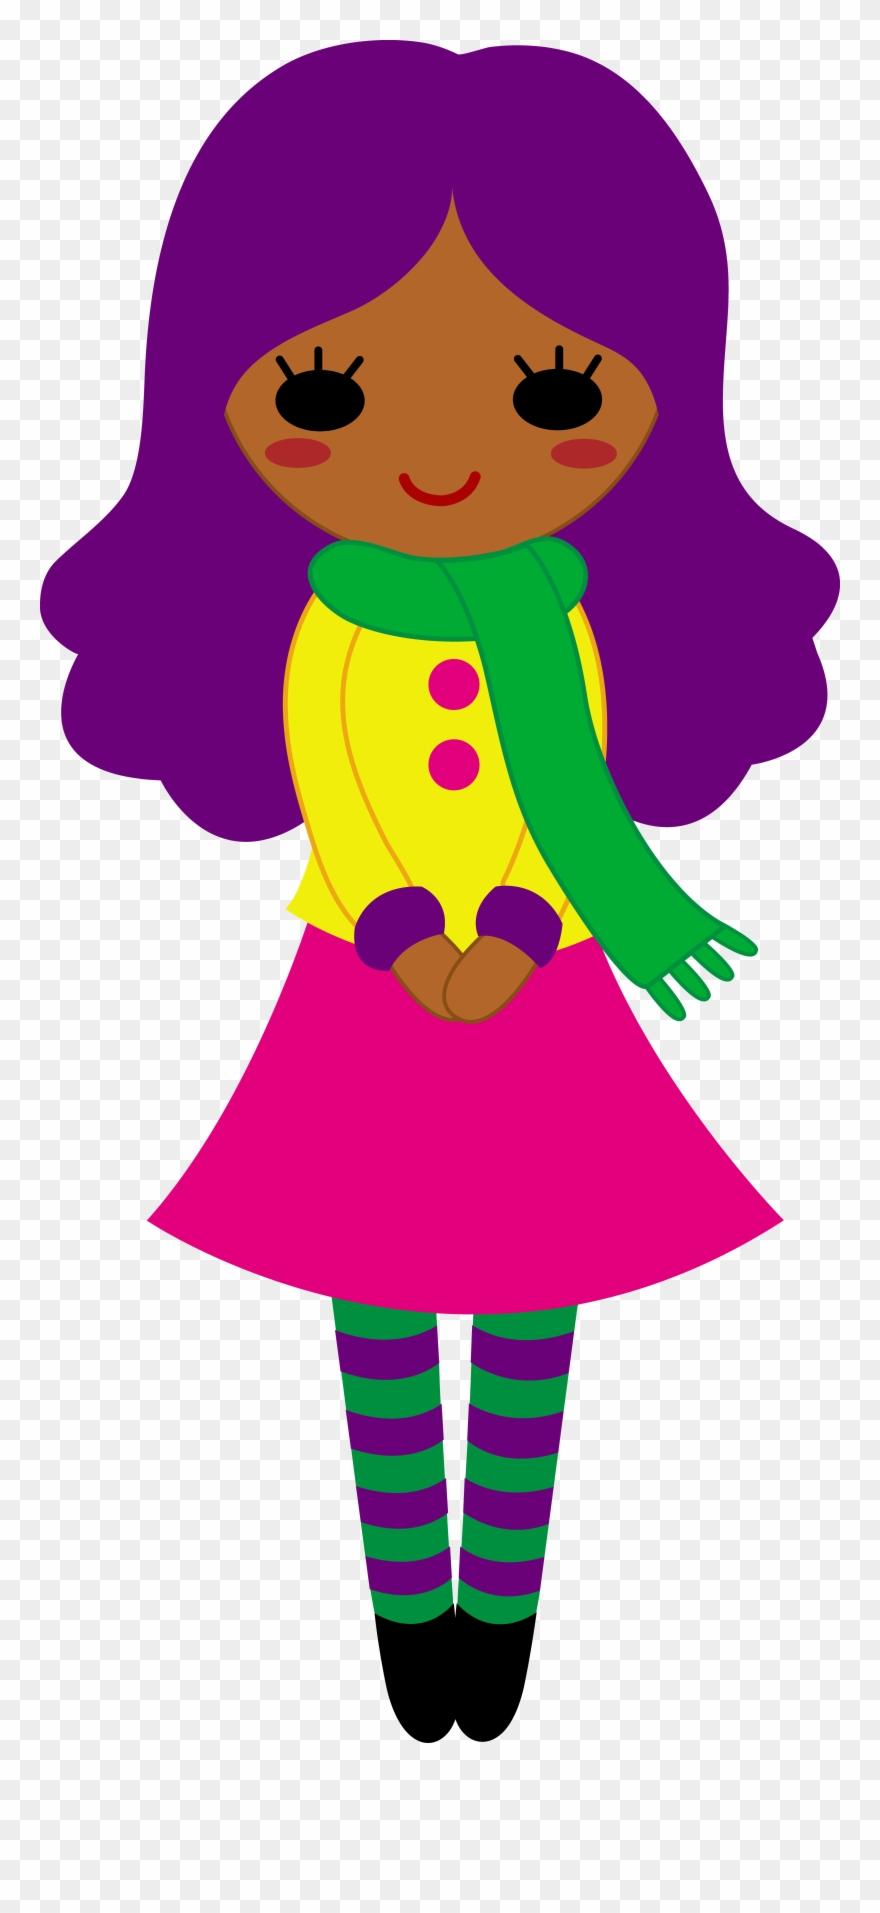 Girl clipart purple. Cute clip art with